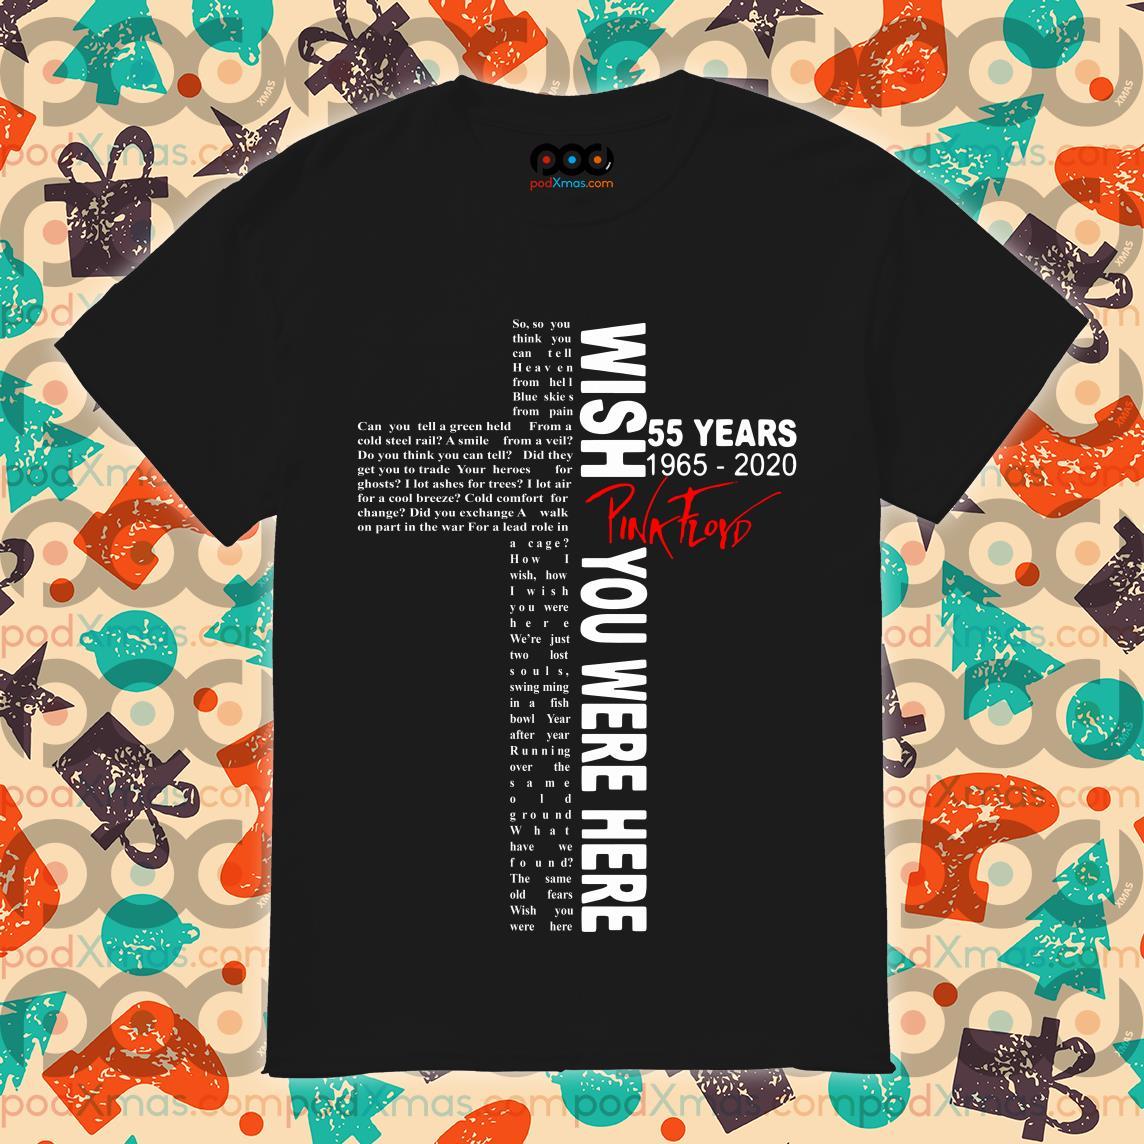 Wish you were here lyrics by Pink Floyd 55 years 1965 2020 shirt